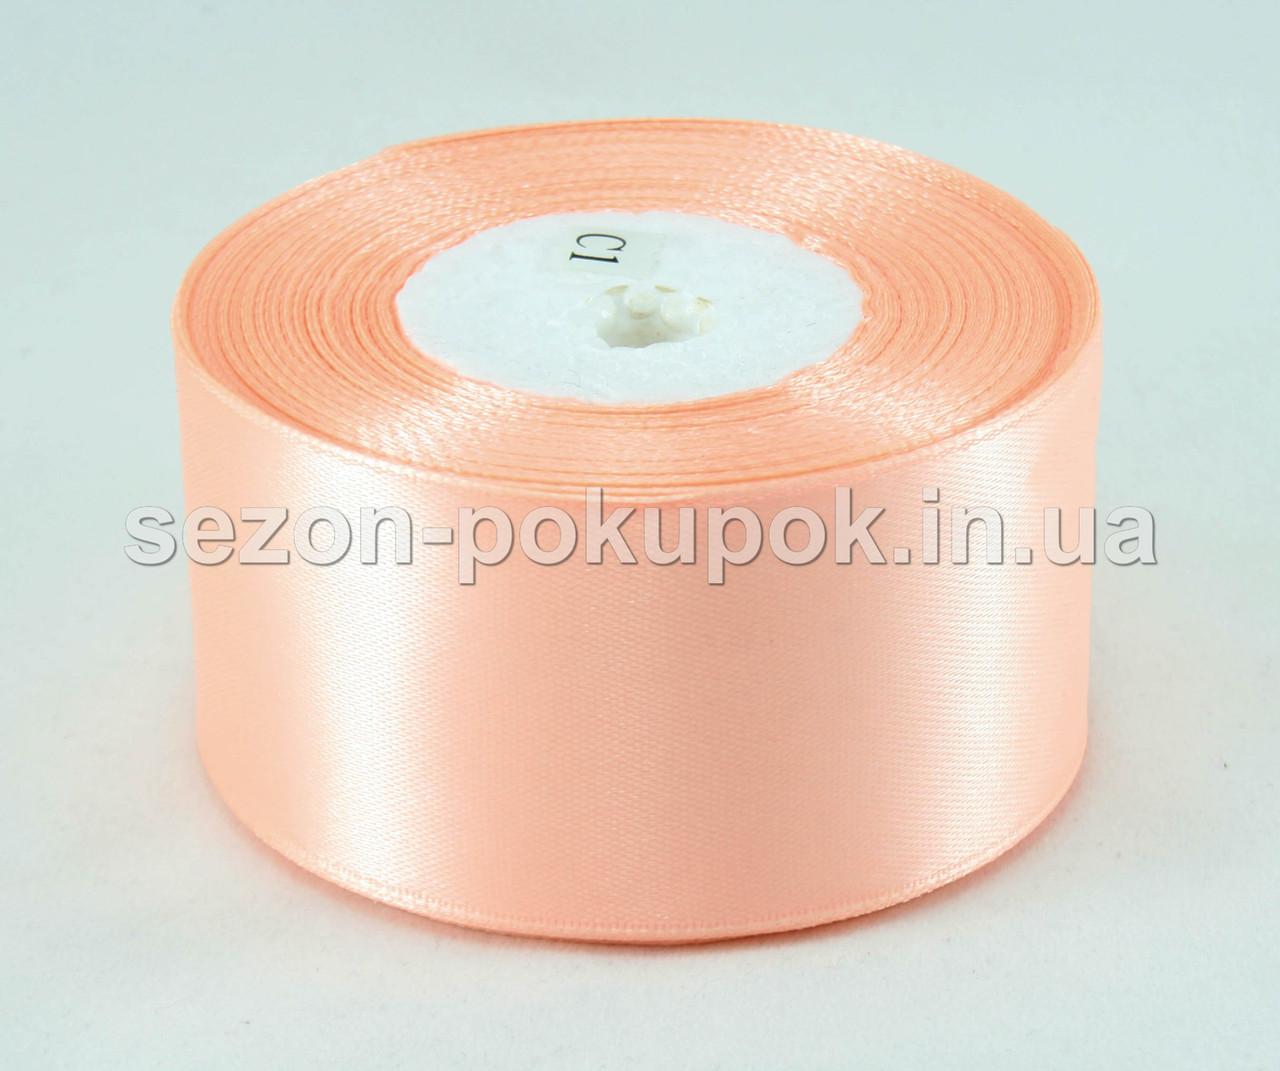 Лента атласная ширина 4 см (23 метра) цвет - персиковый